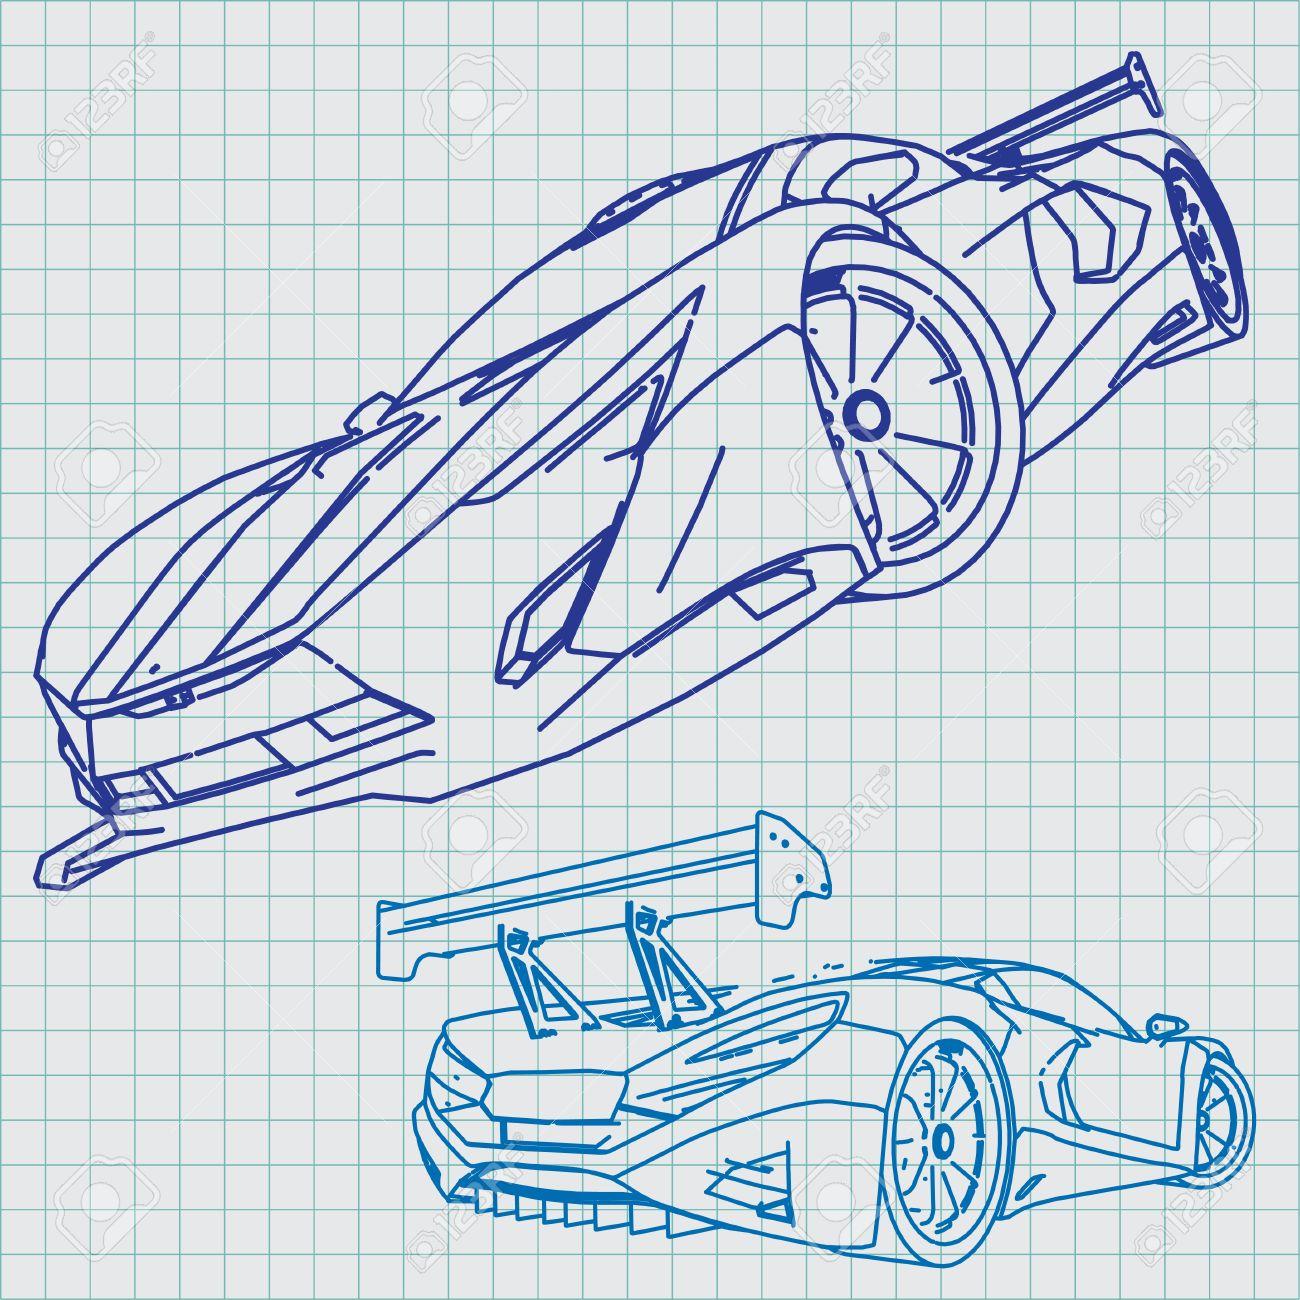 Sports car sketch blueprint royalty free cliparts vectors and sports car sketch blueprint stock vector 29228864 malvernweather Choice Image